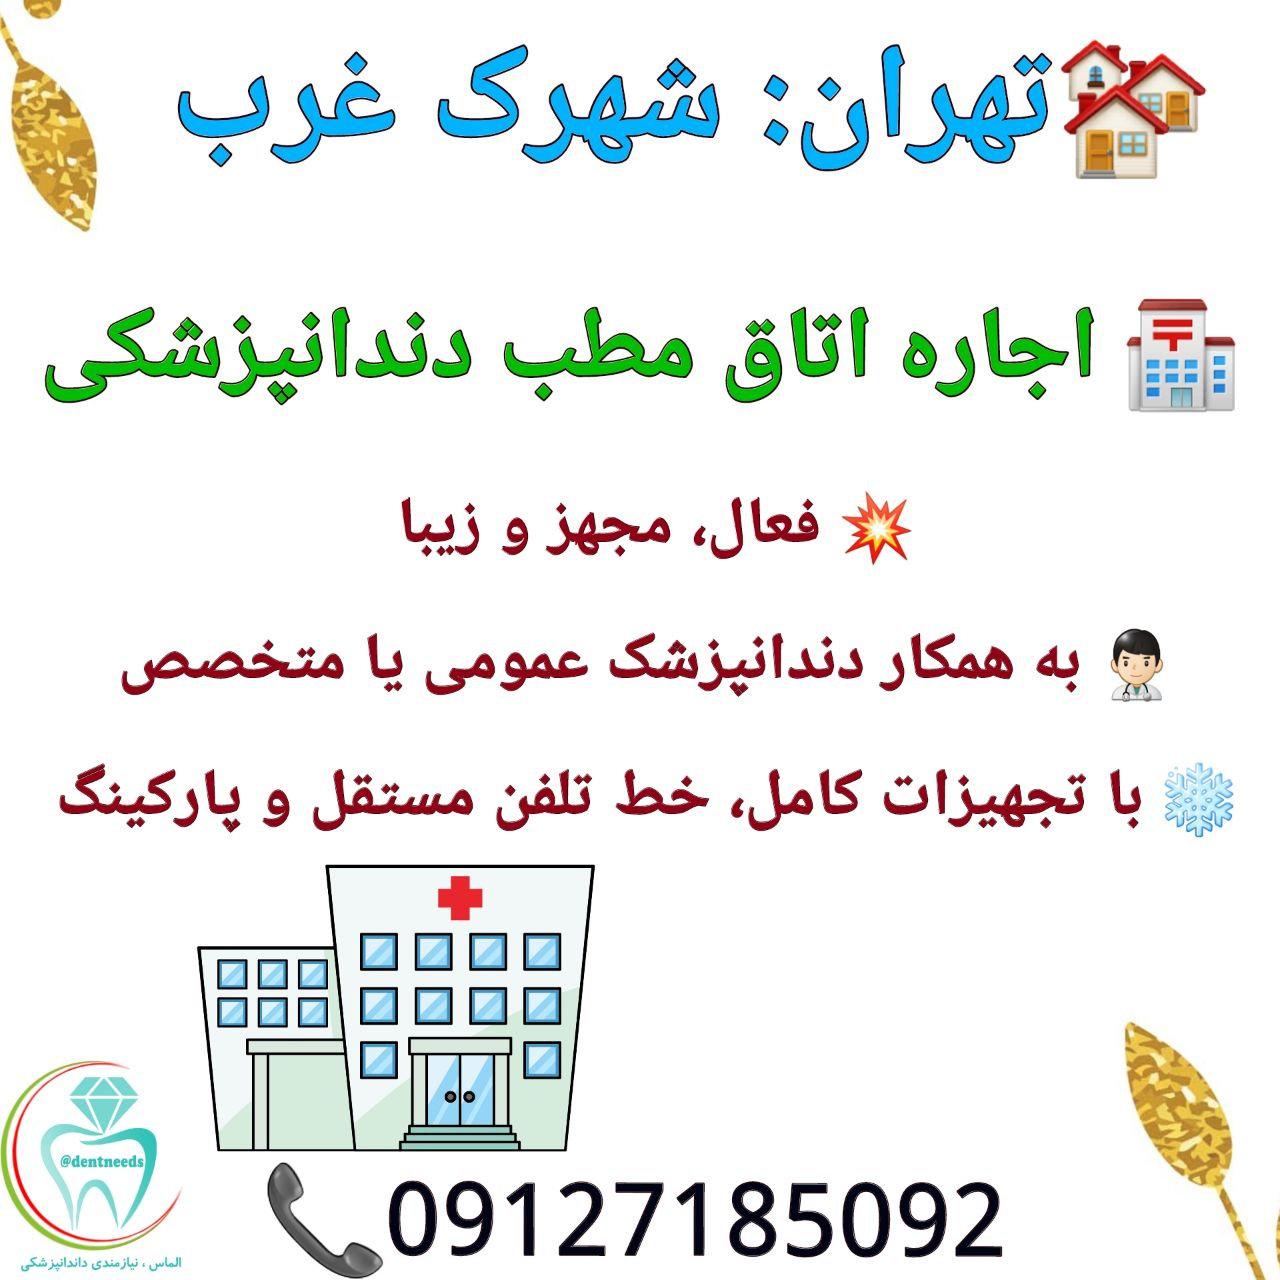 تهران: شهرک غرب، اجاره اتاق مطب دندانپزشکی